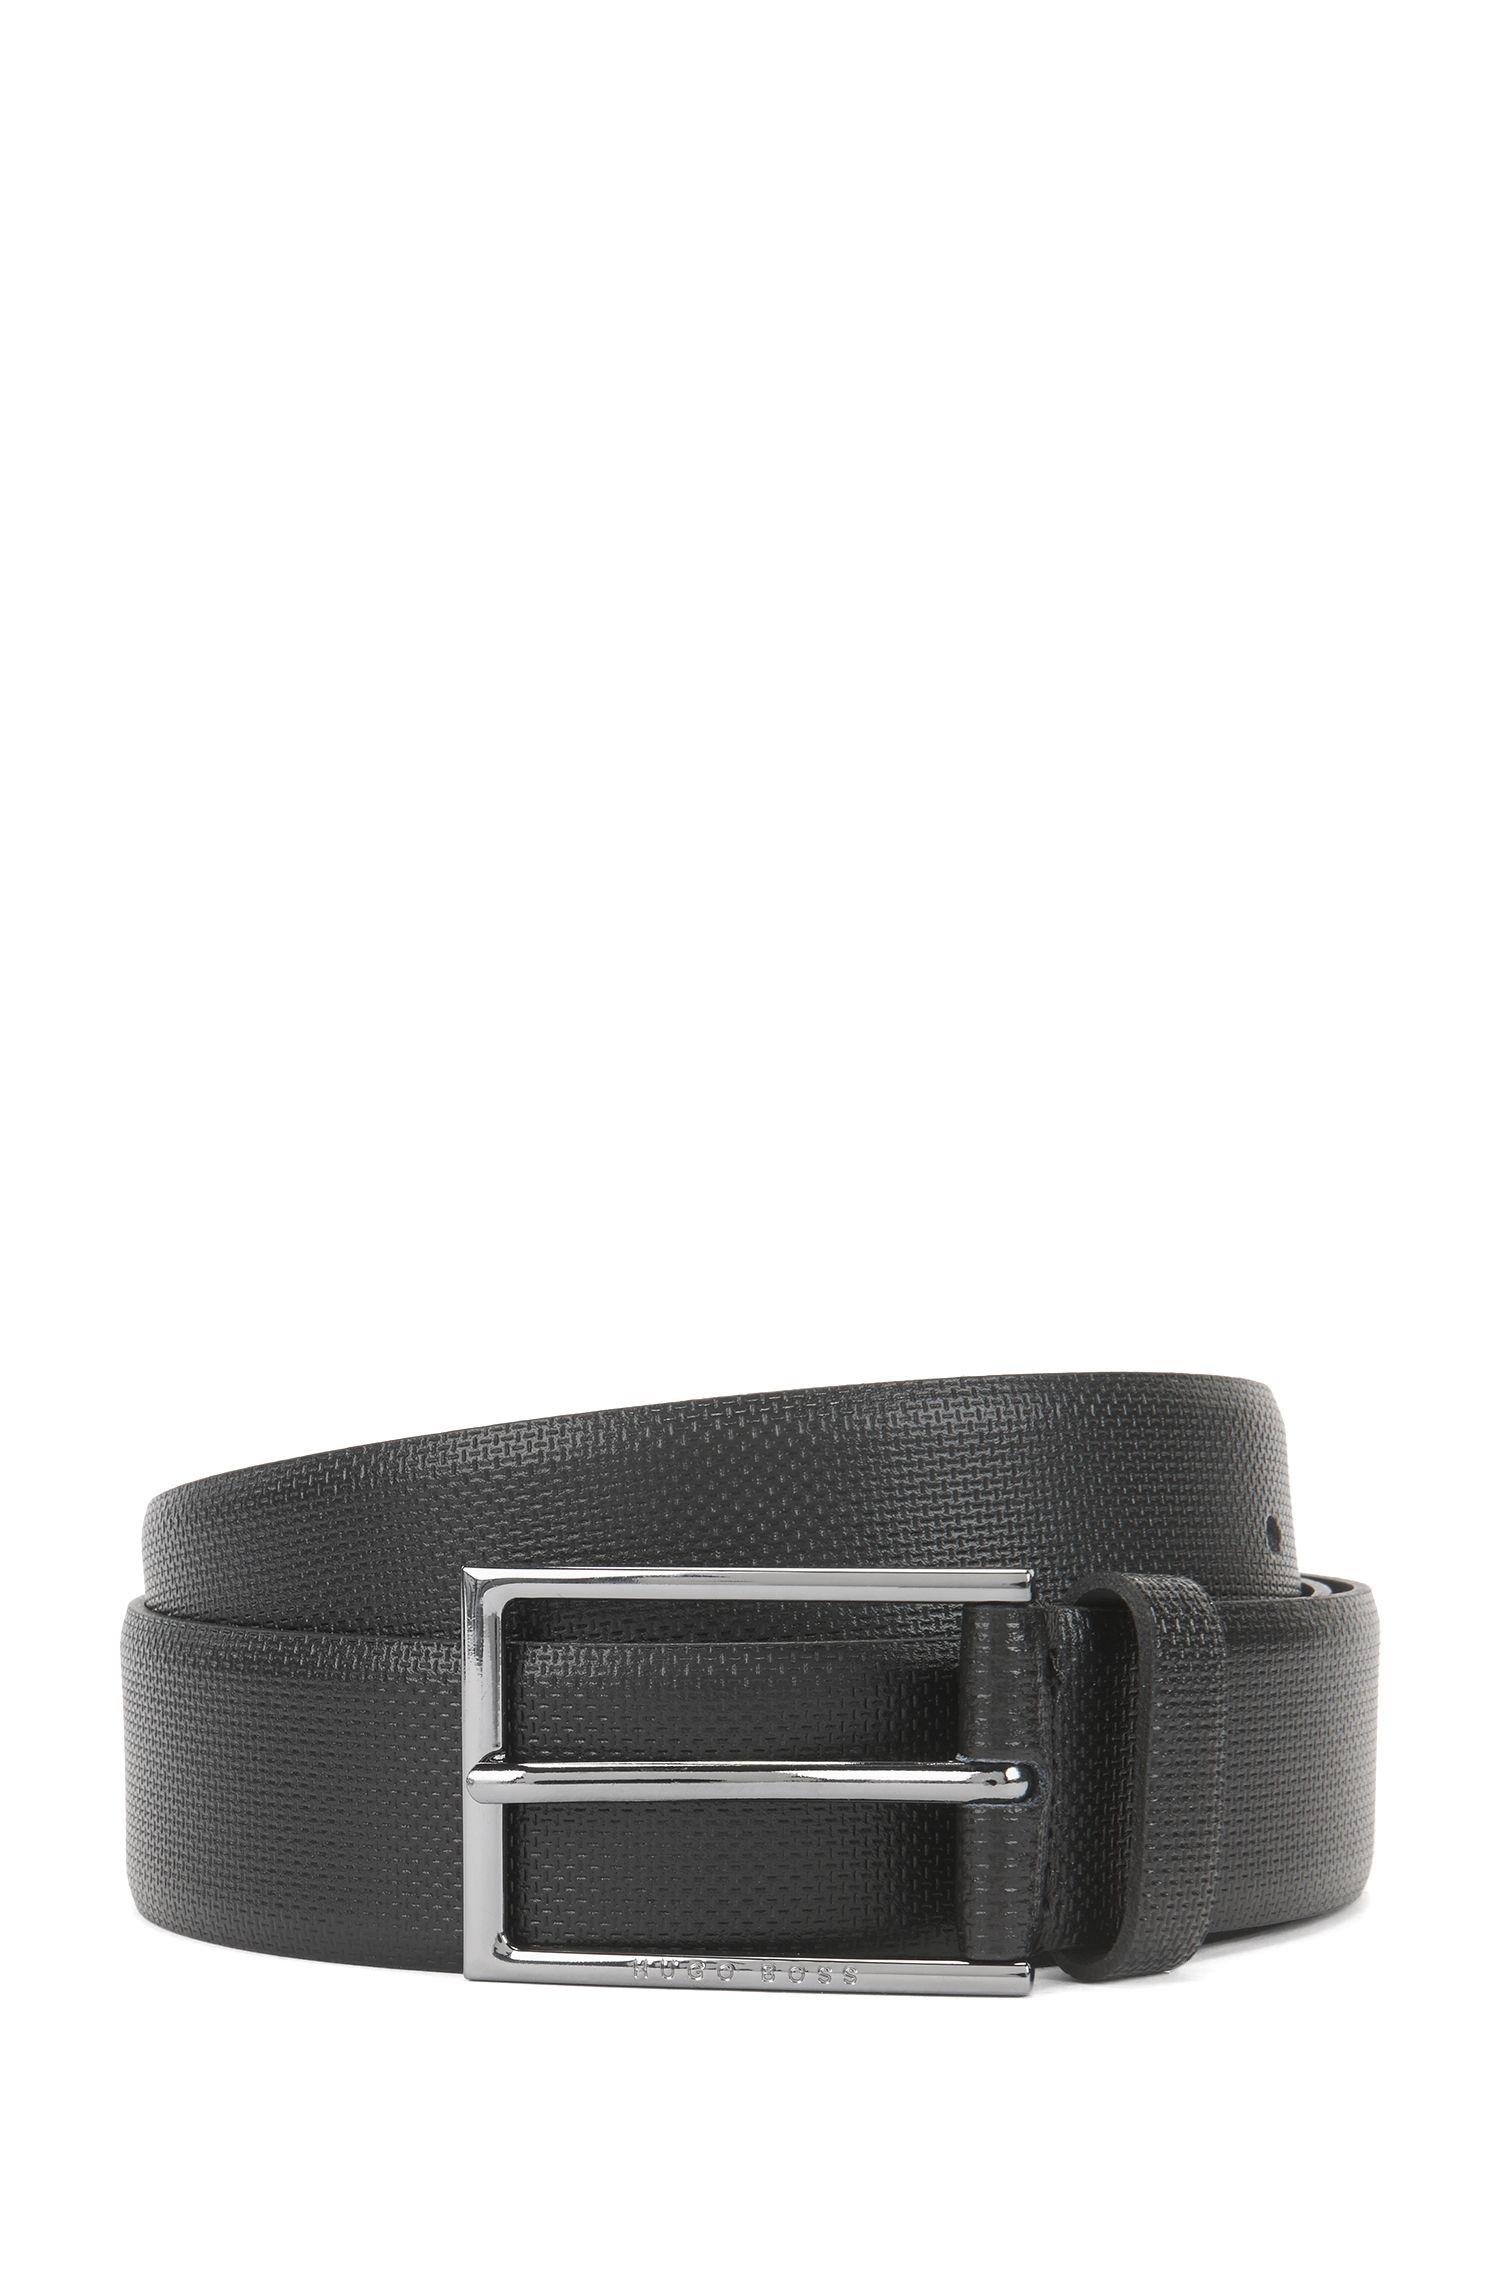 'Carmello S' | Leather Printed Belt